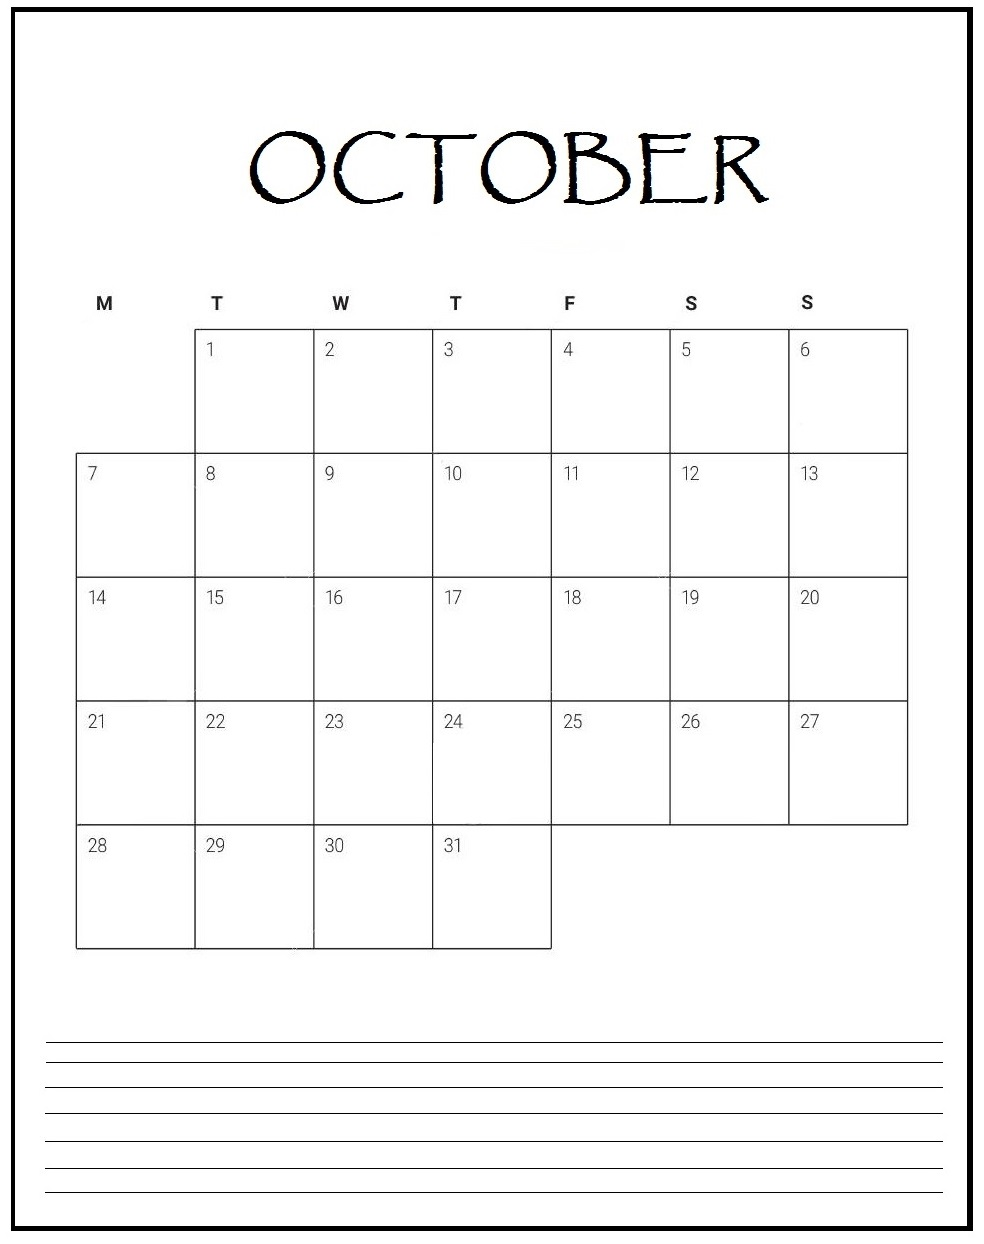 October 2019 Blank Planner